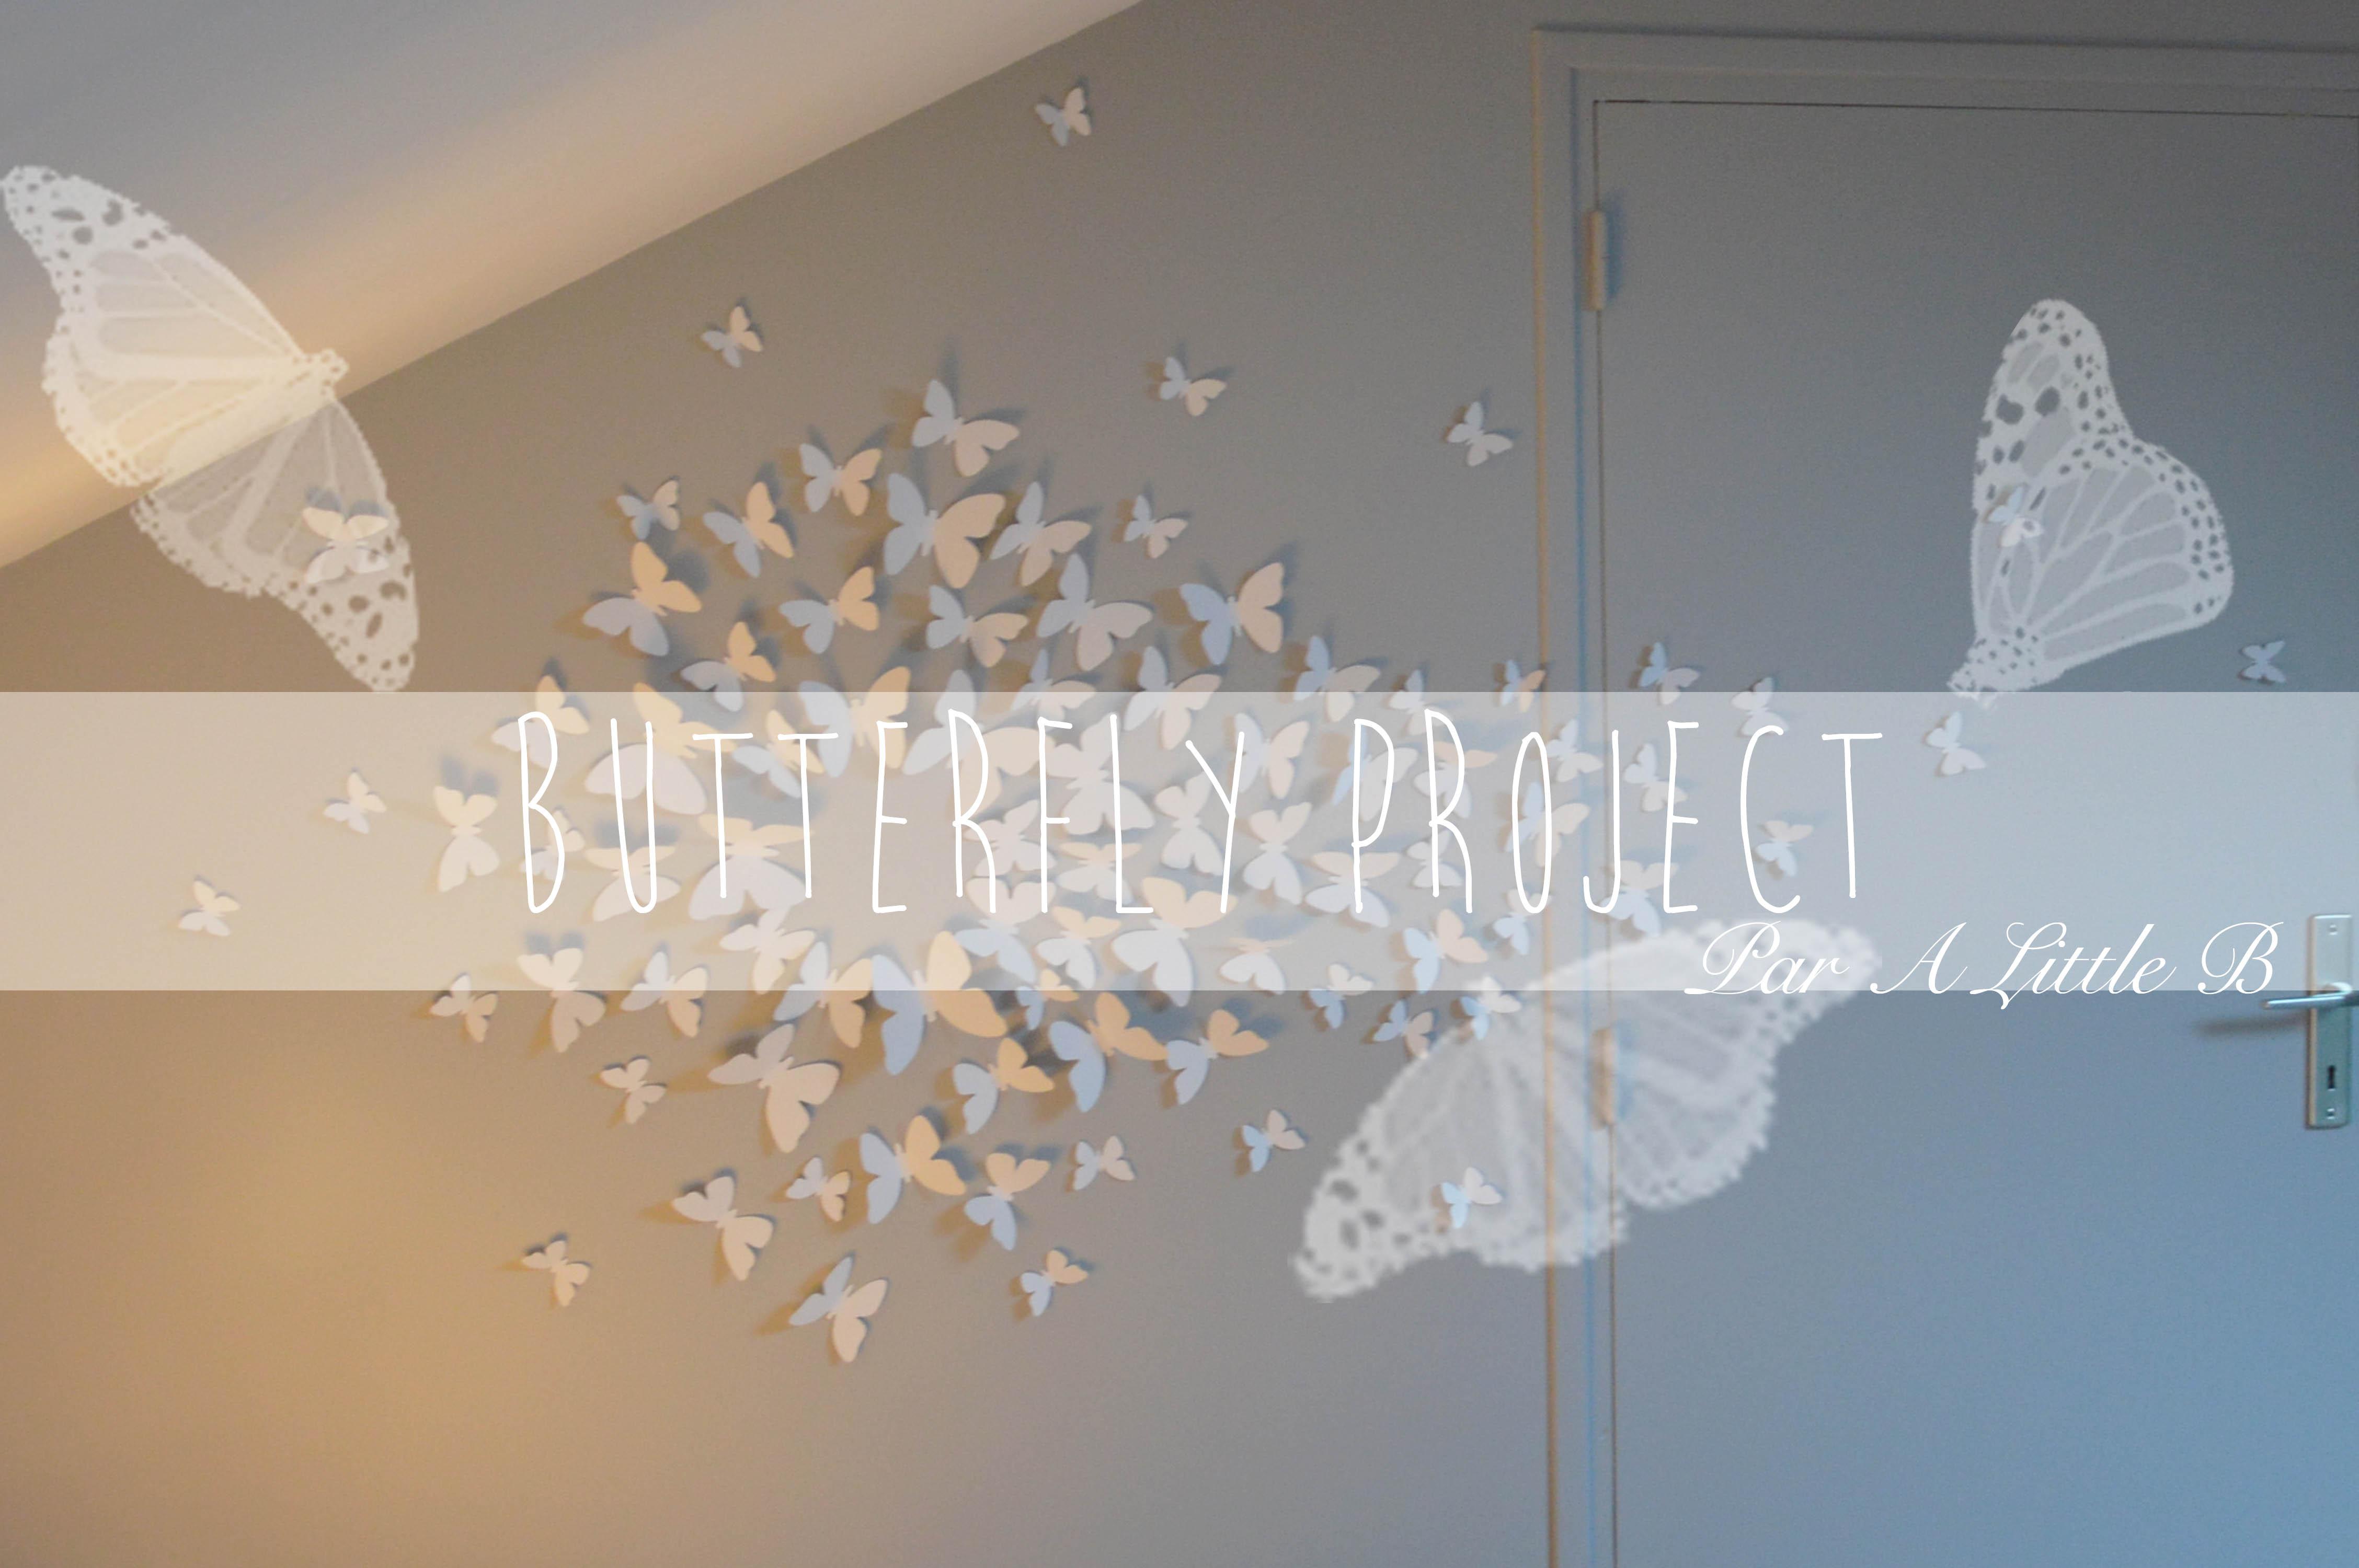 a little b blog beaut maman lyon diy deco butterfly project a little b blog. Black Bedroom Furniture Sets. Home Design Ideas